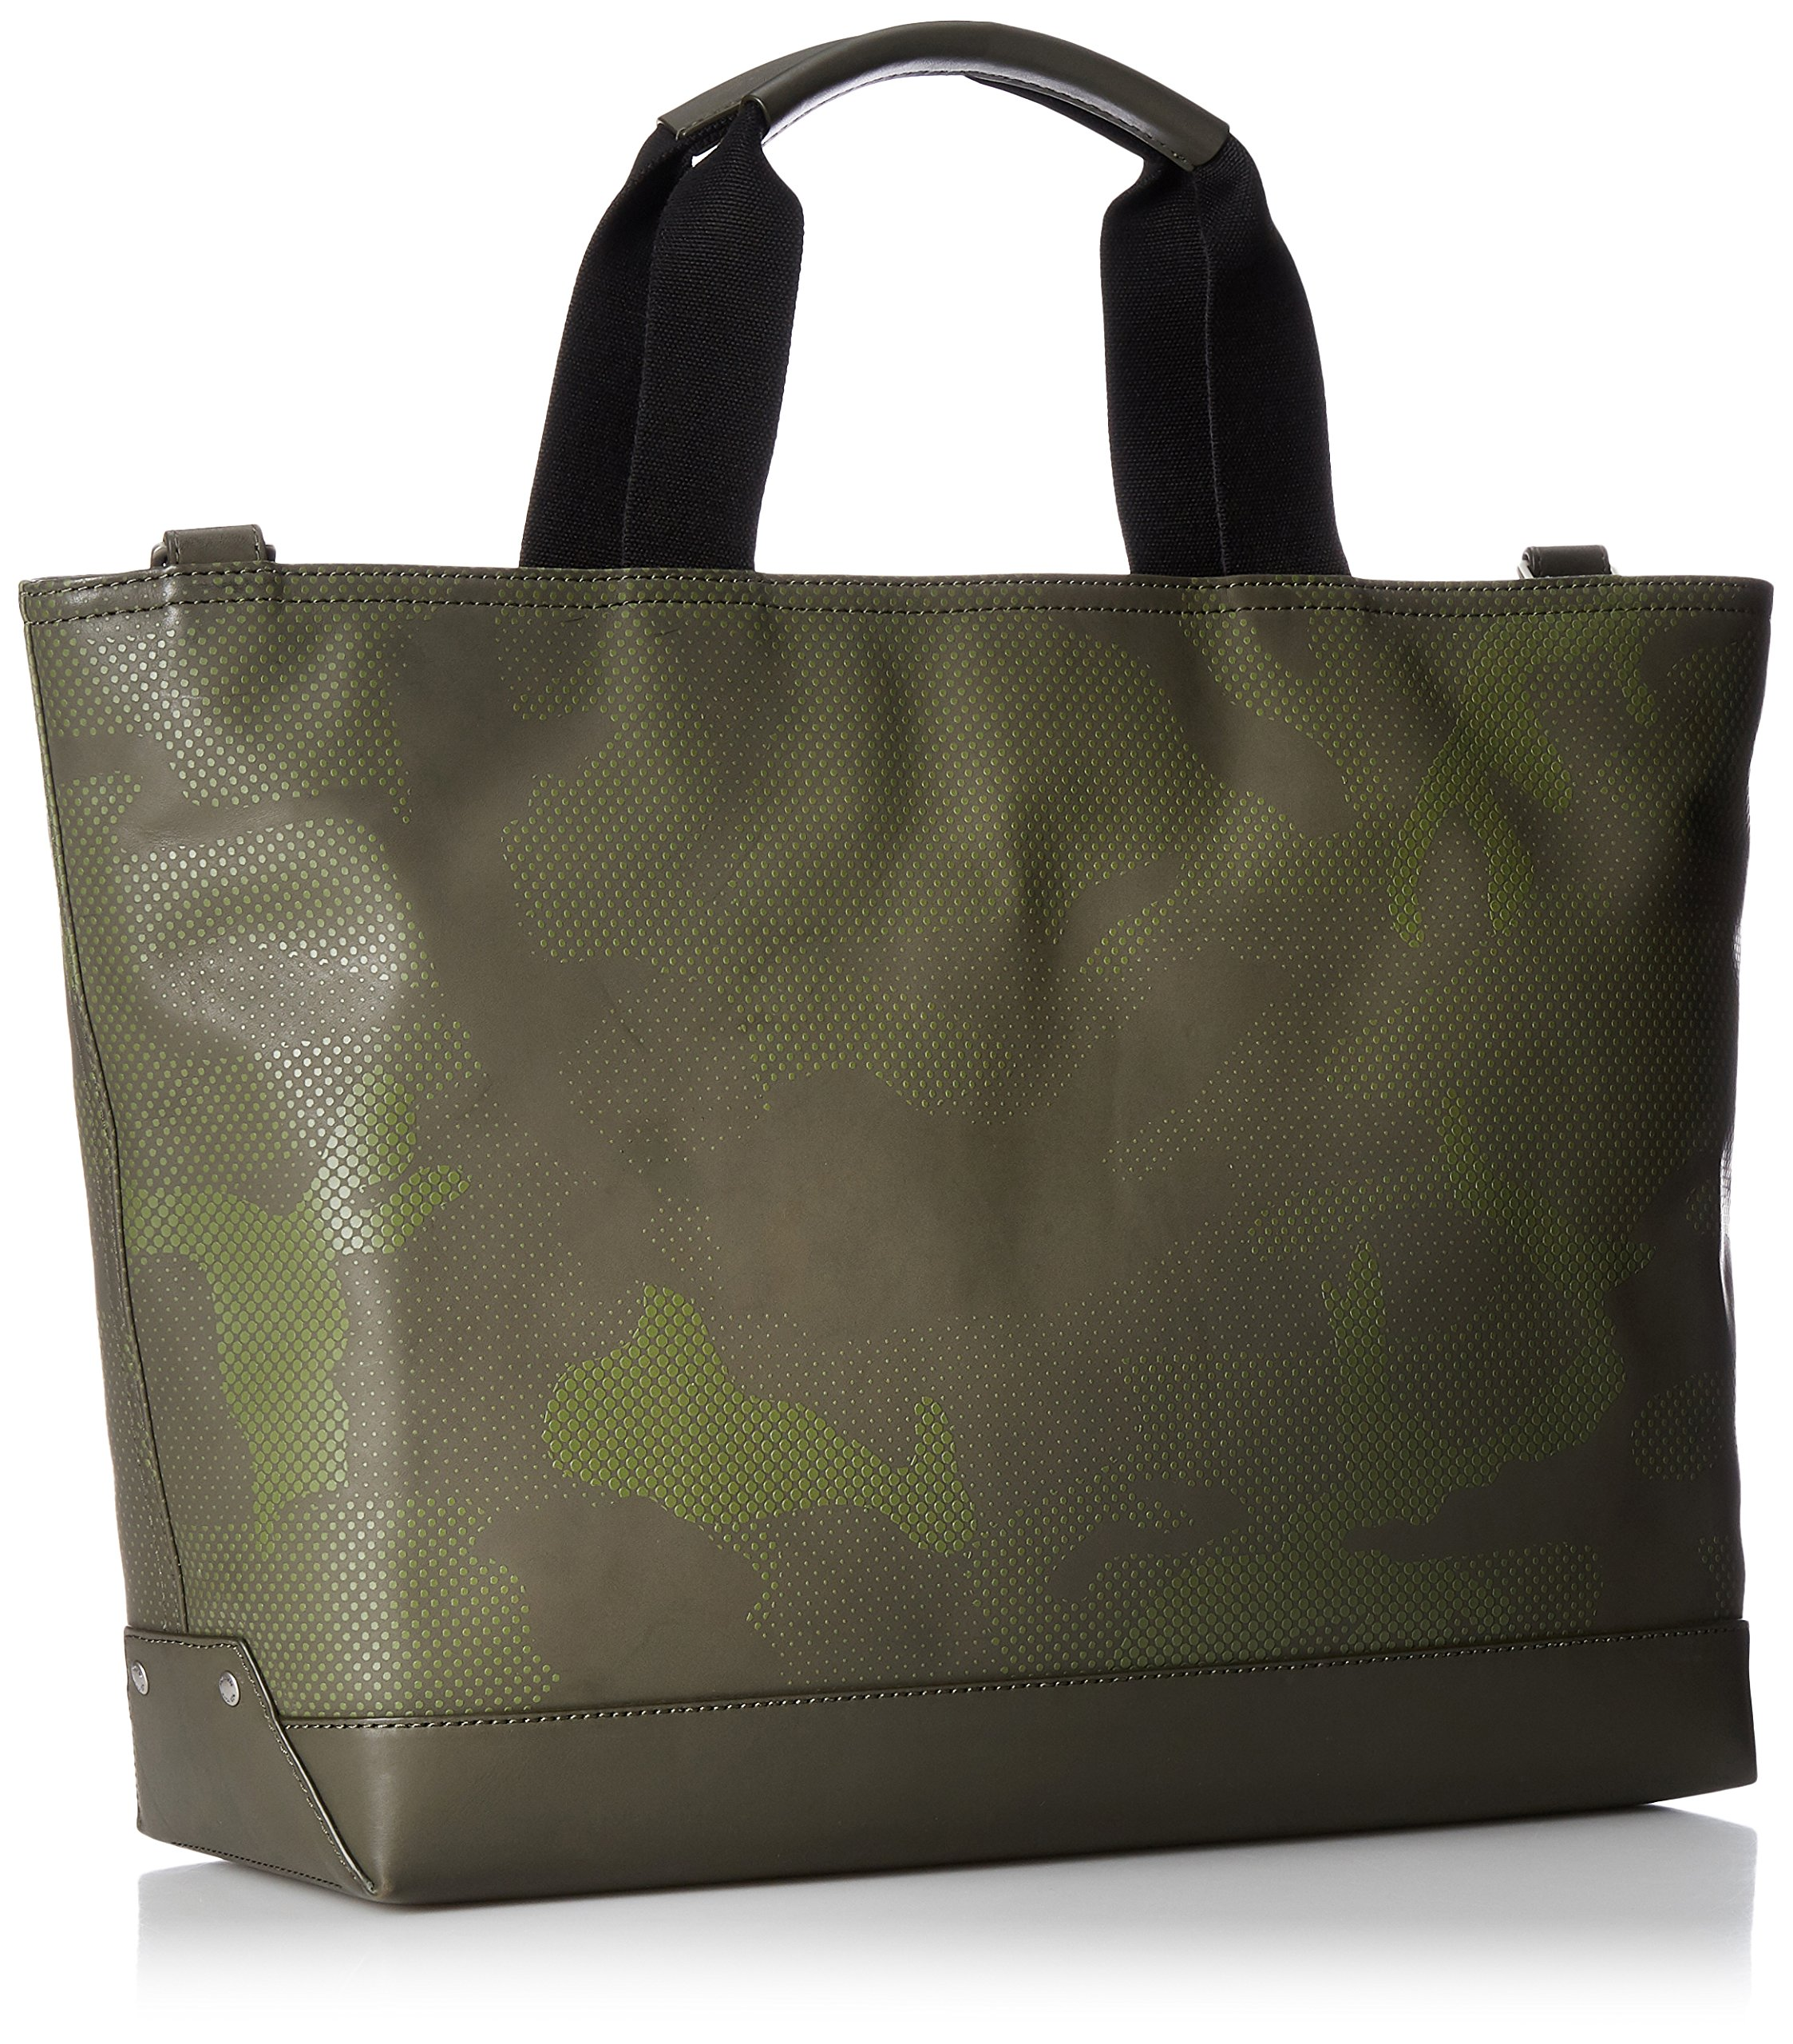 Jack Spade Men's Camo Dots Coal Bag, Army Green by Jack Spade (Image #2)